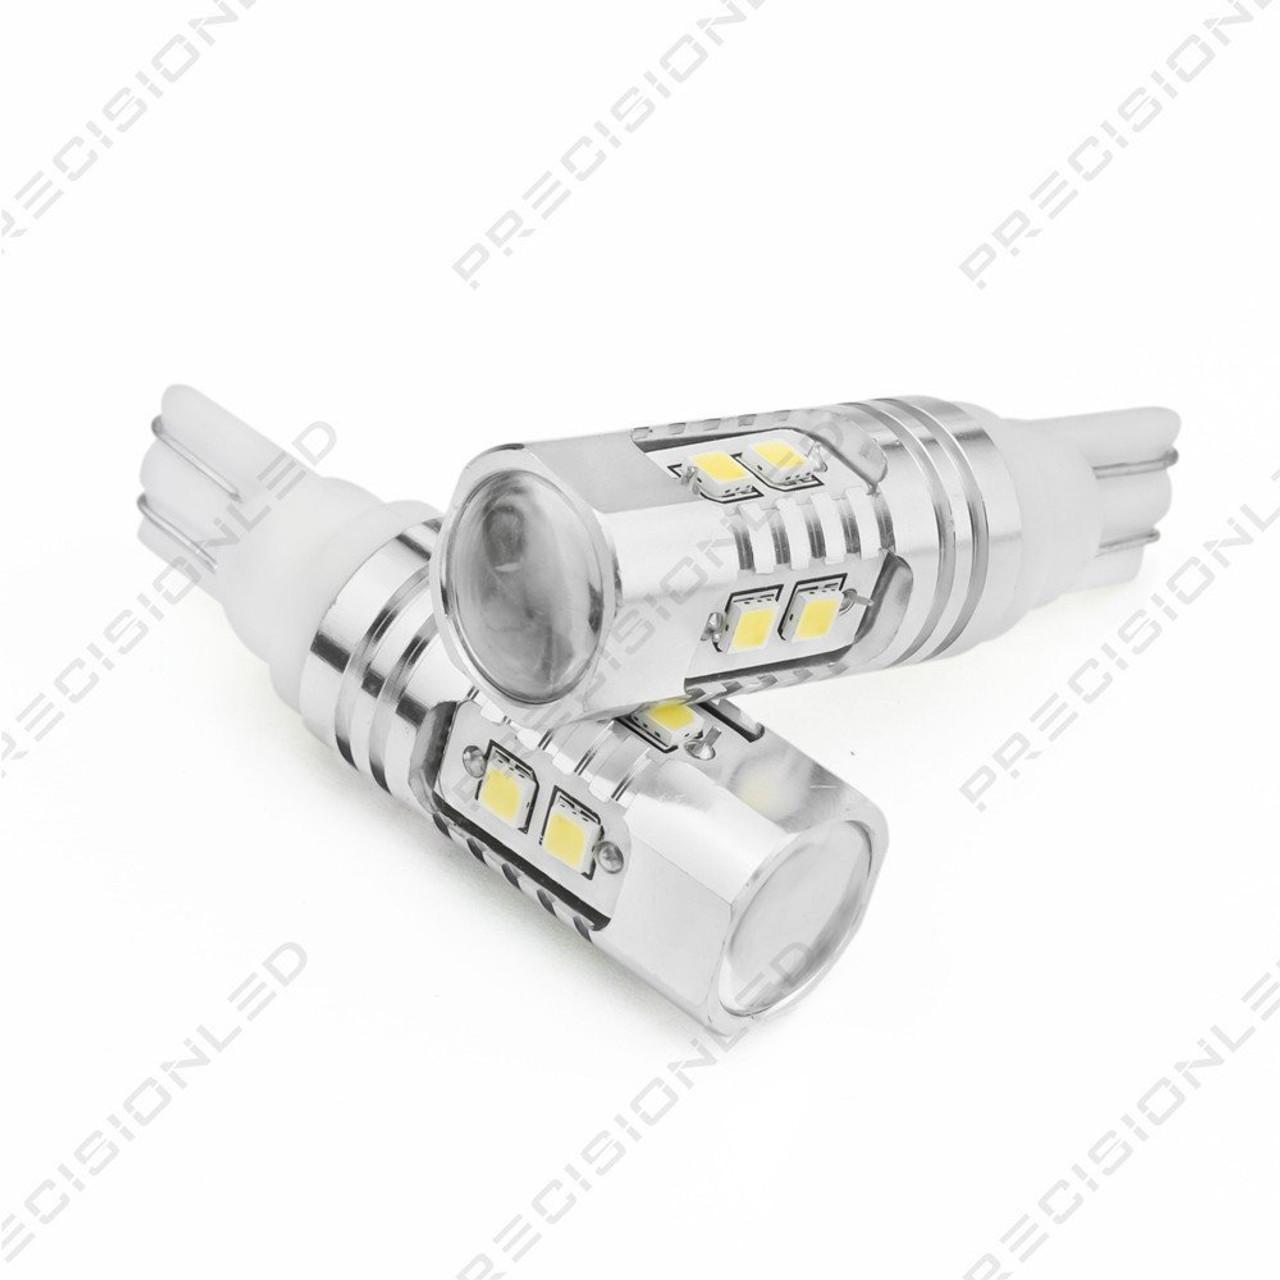 Volkswagen Touareg LED Backup Reverse Lights (2011-Present)